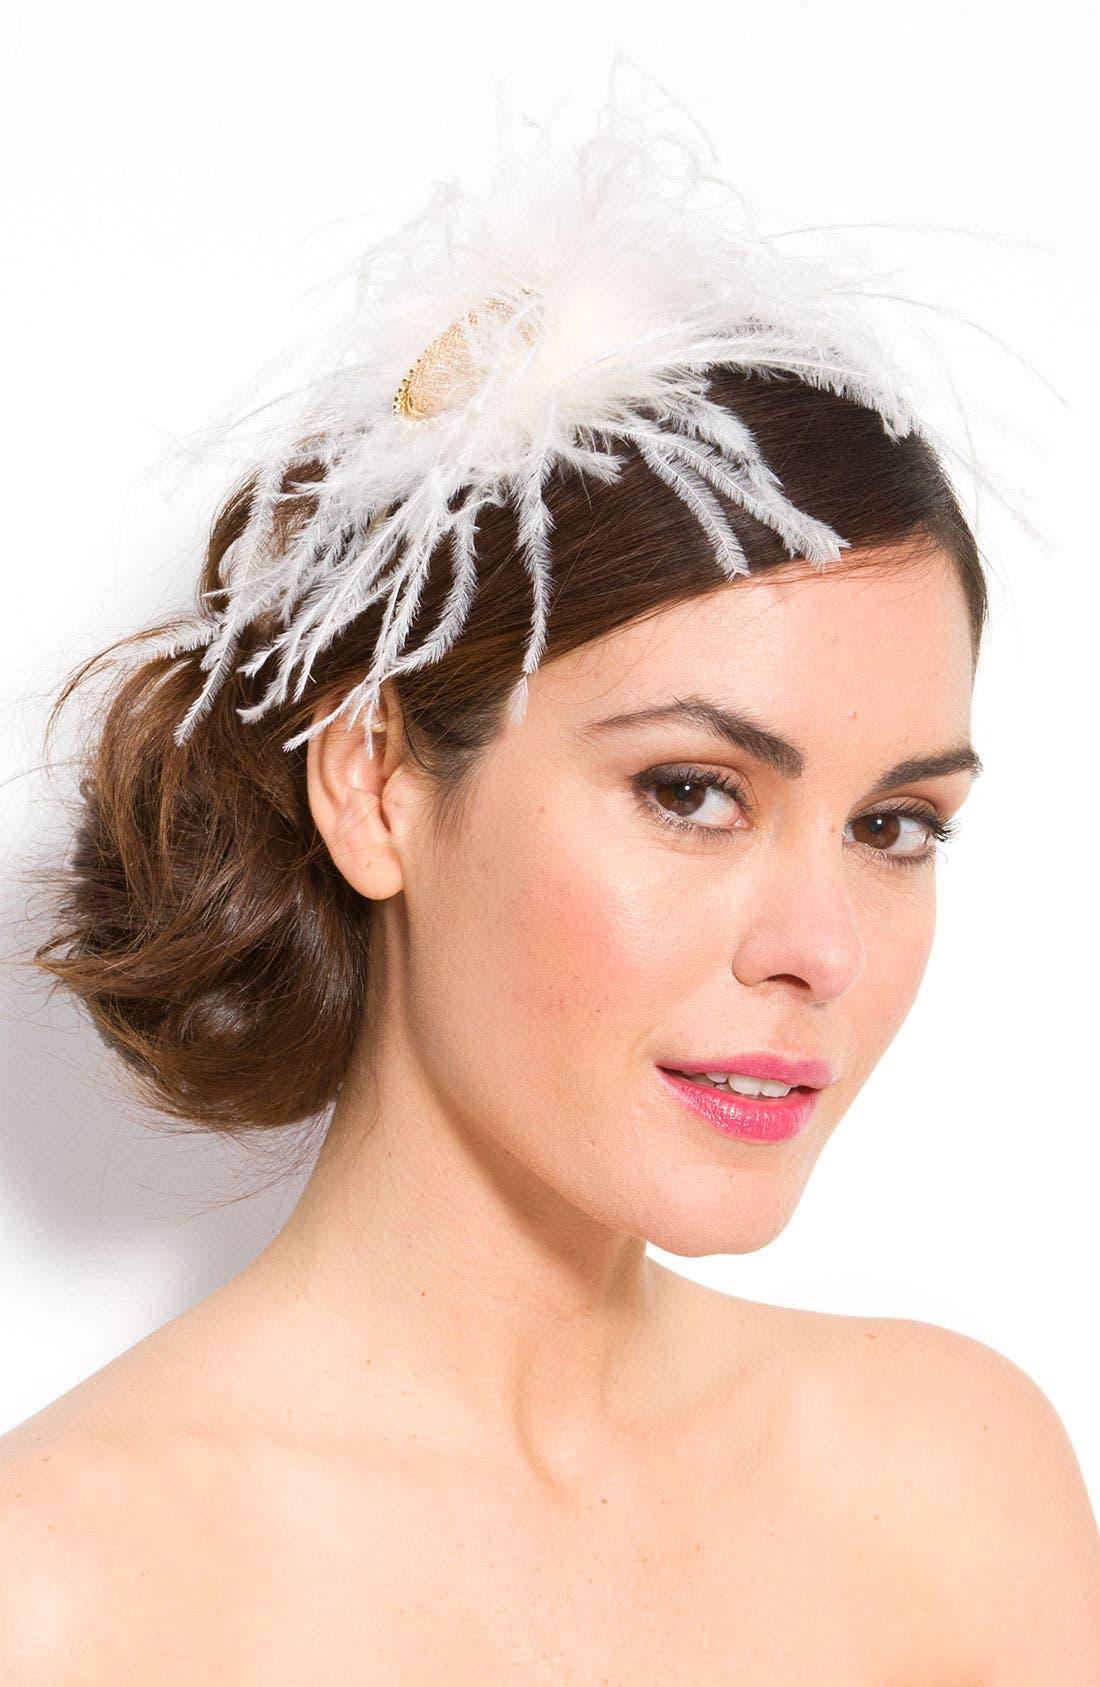 Alternate Image 1 Selected - Tasha 'Fancy Frock' Feather Fascinator Headband